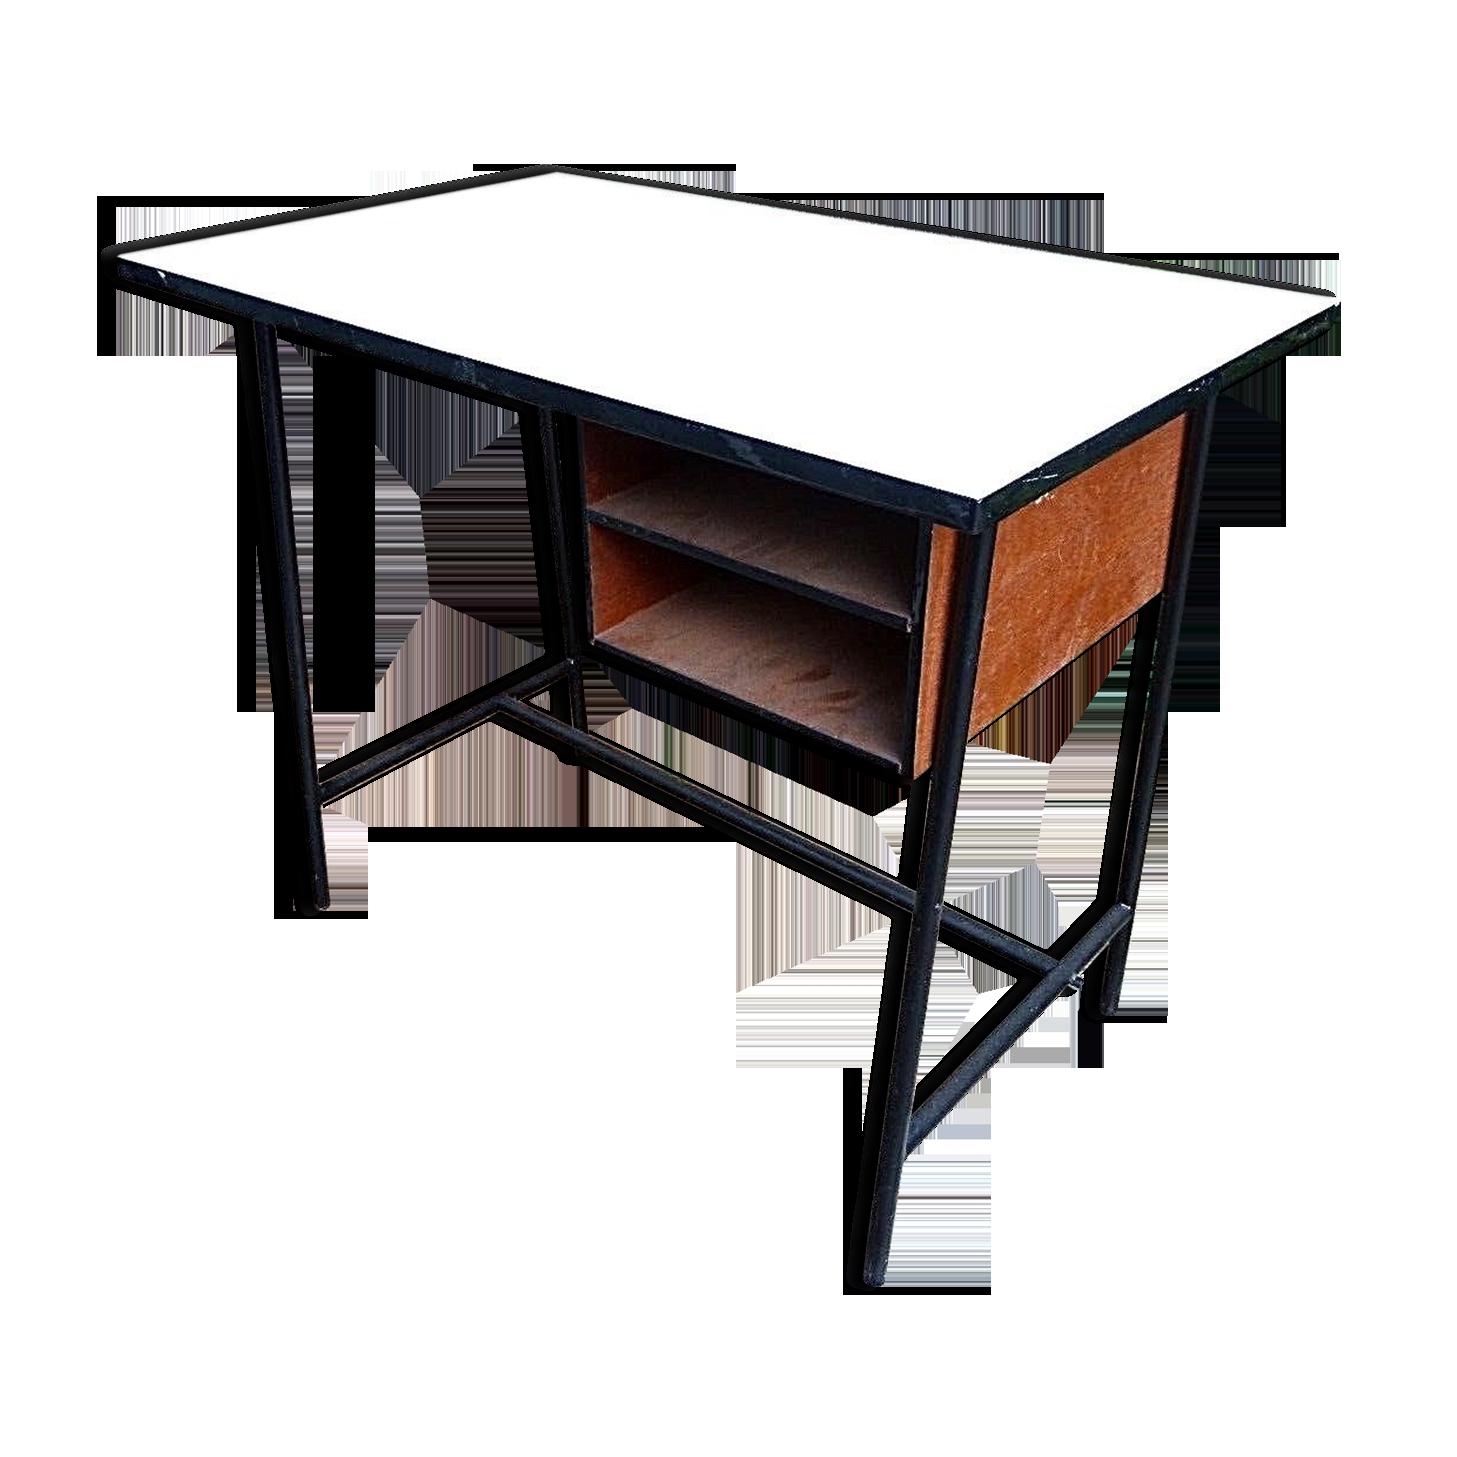 Bureau design scandinave vintage métal noir scandinave